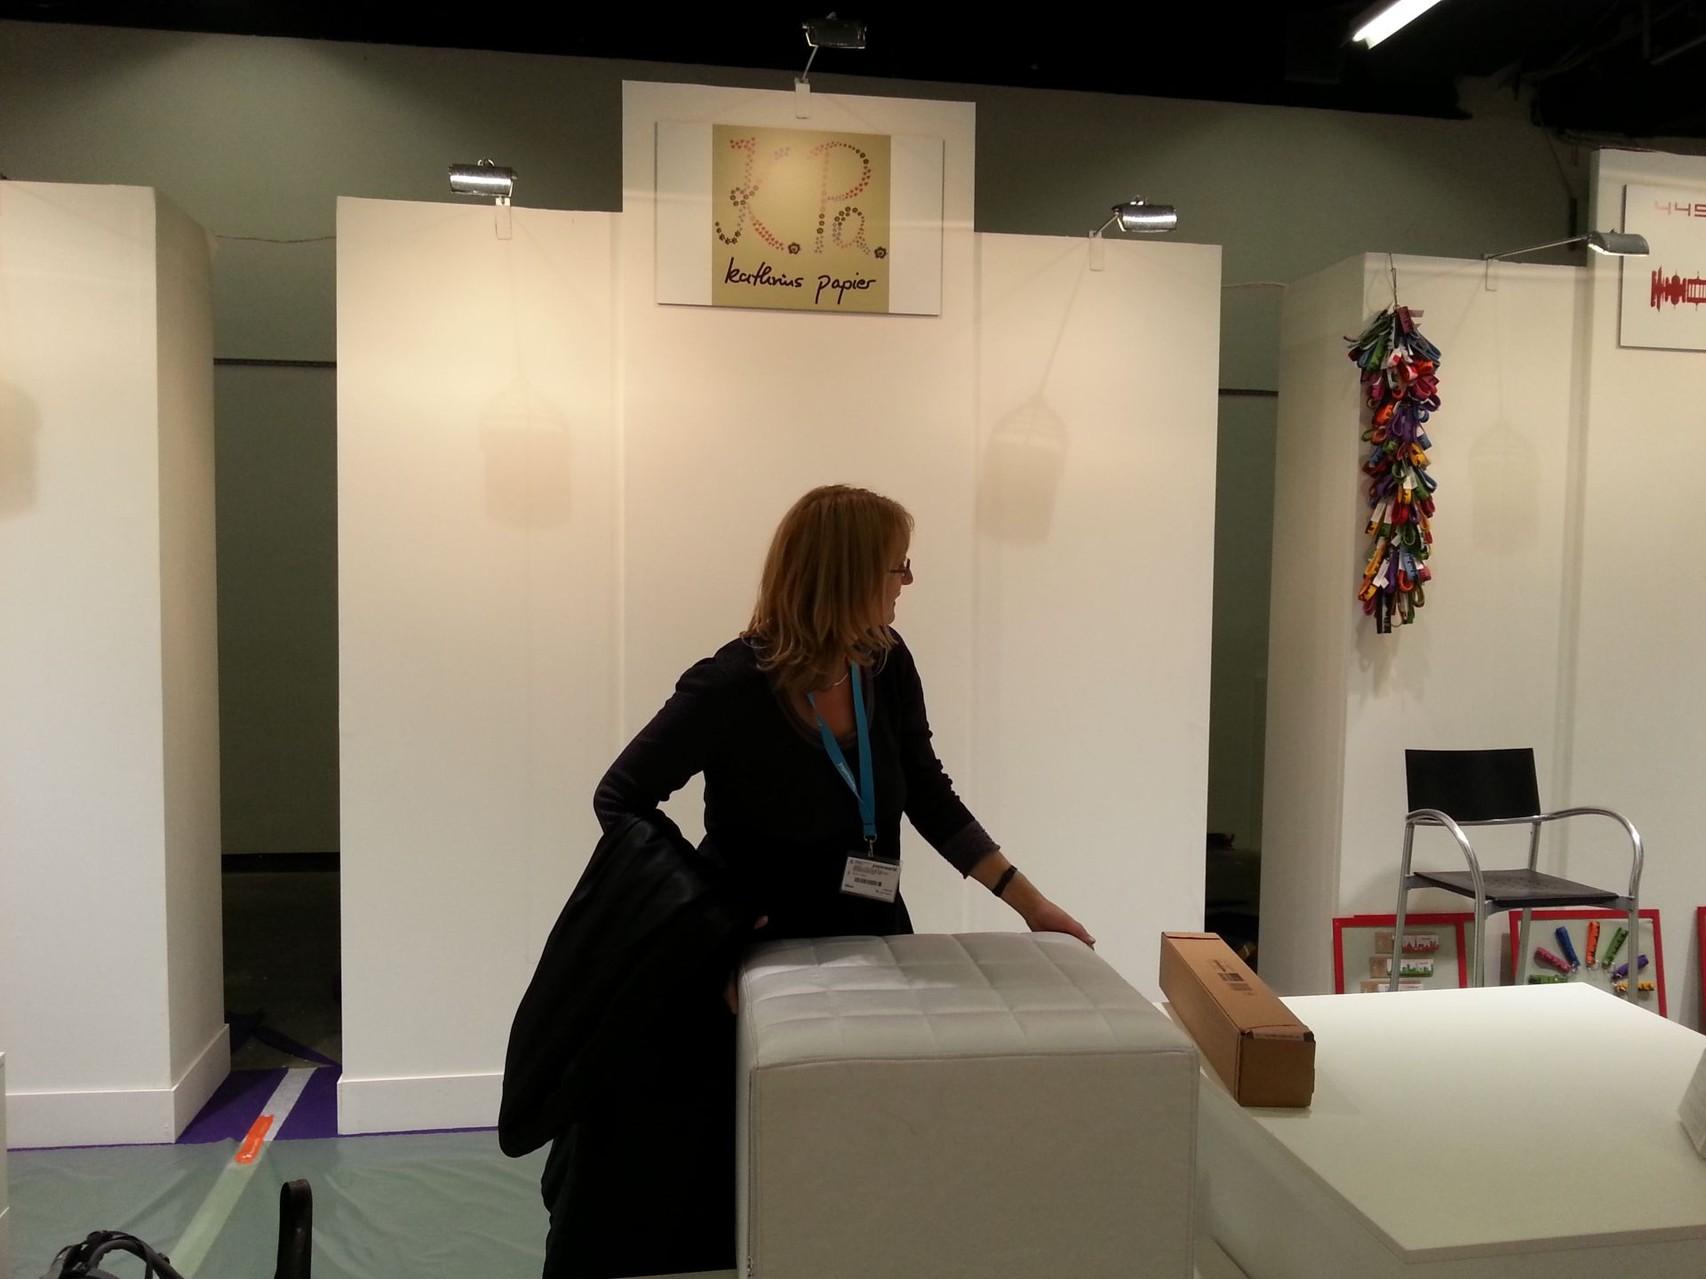 Kathrins Papier Aufbau Paperworld 2014